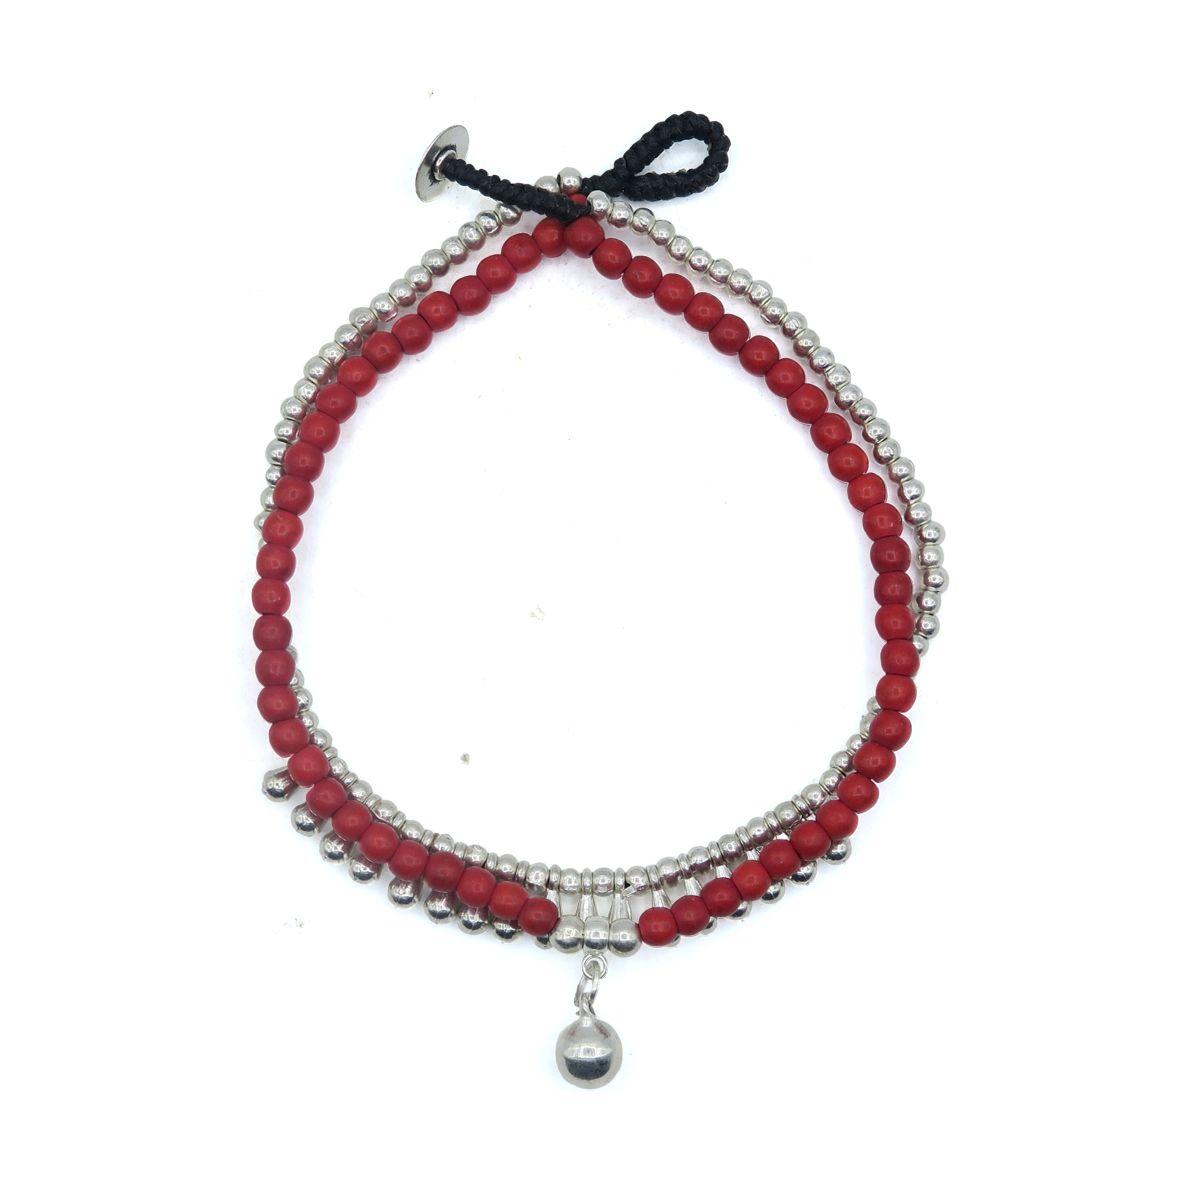 Made in Bali Jewelry Designs